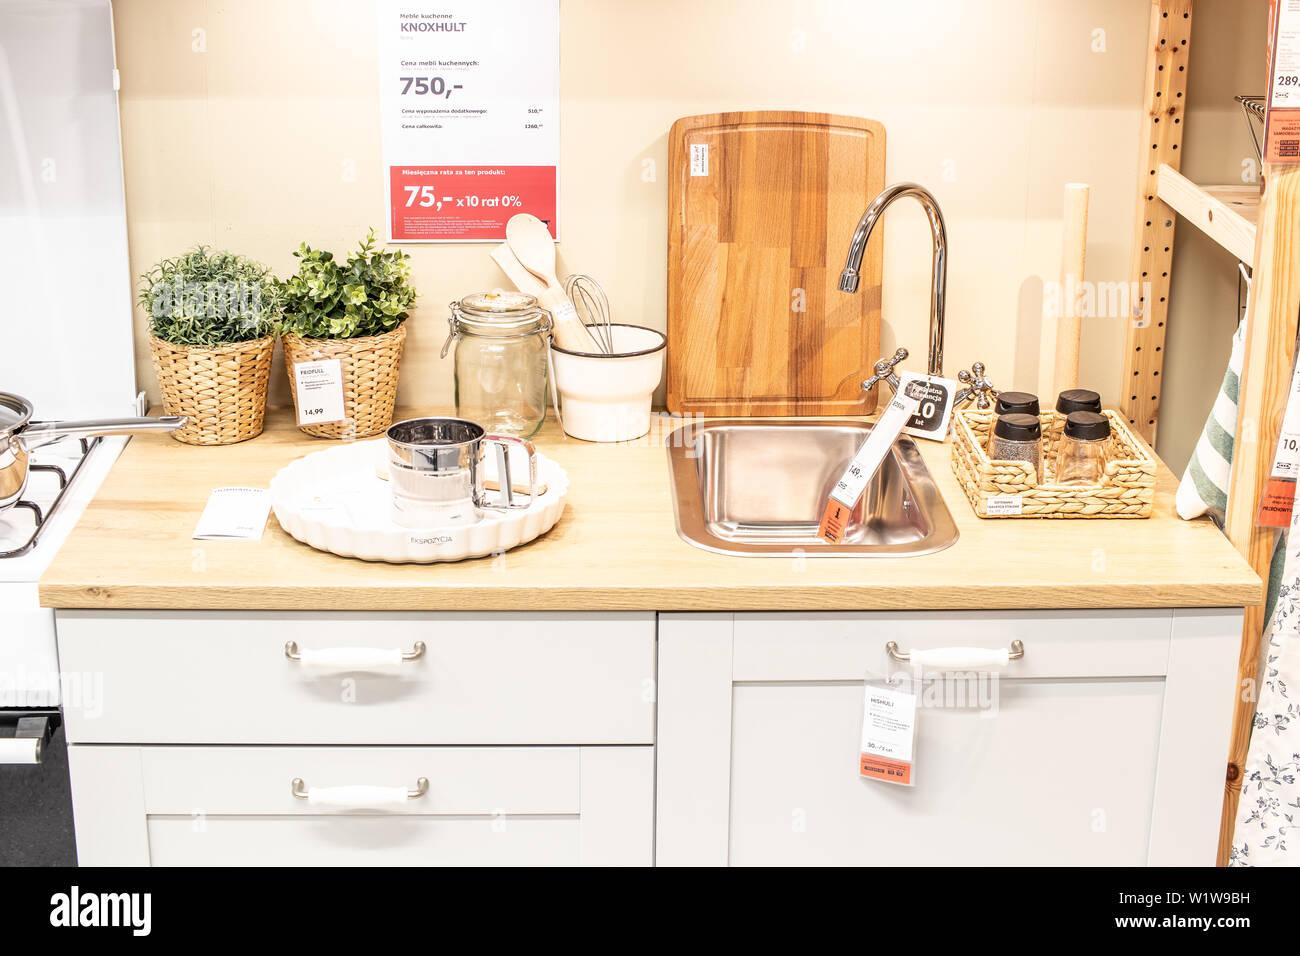 Lodz Poland Jan 2019 Exhibition Interior Ikea Store